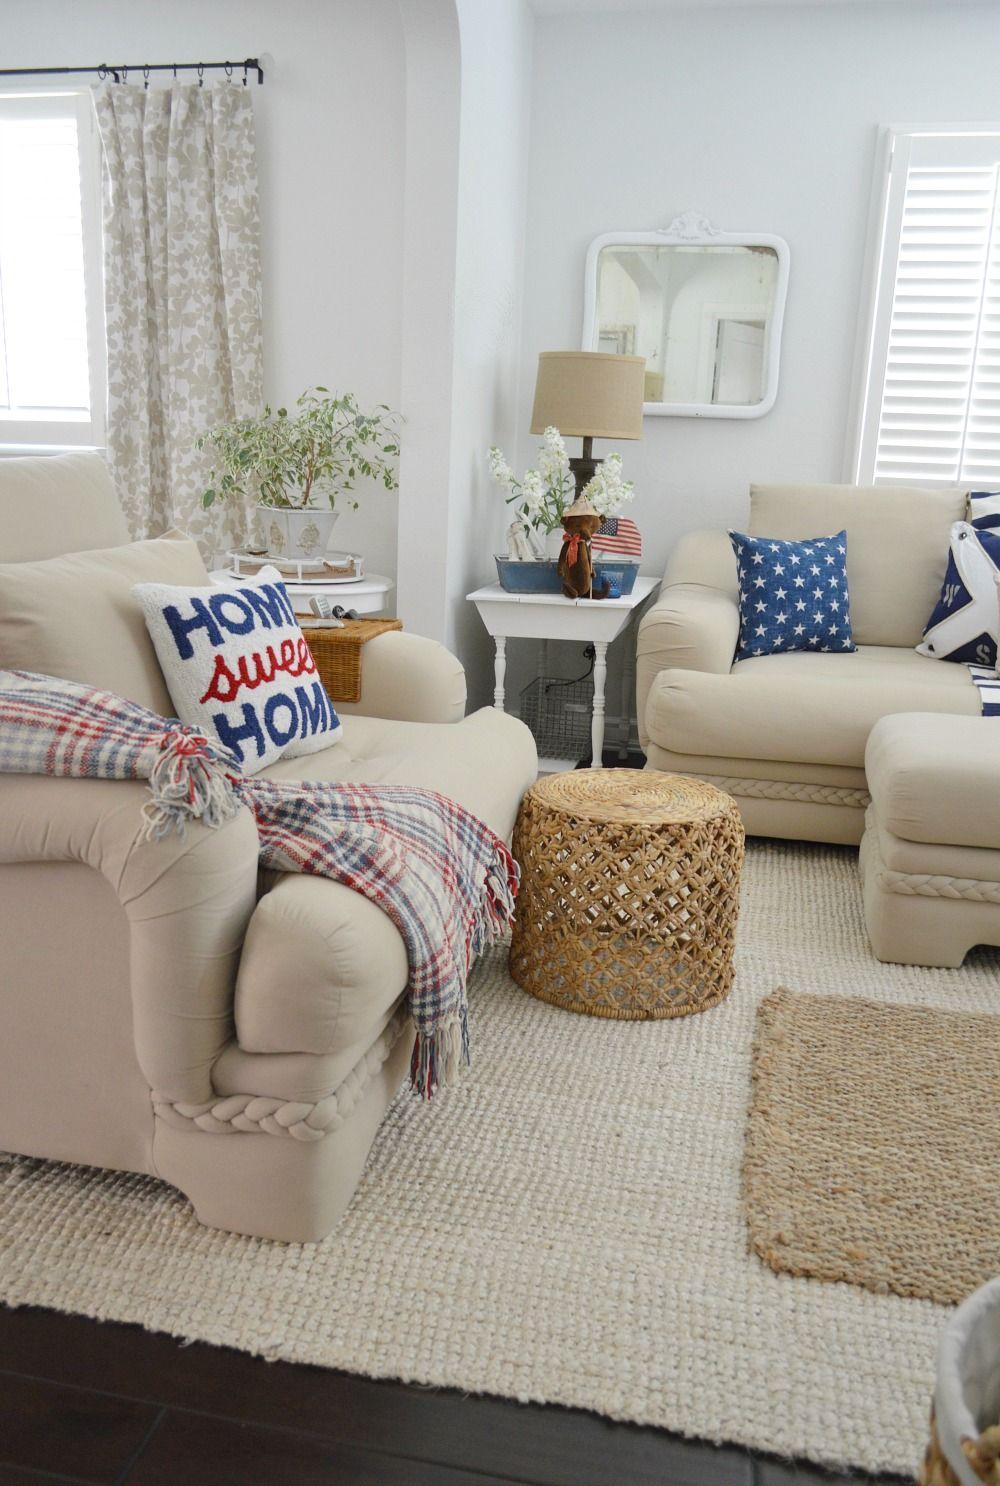 Patriotic Coastal Cottage Living Room Living Room Decor Neutral Coastal Cottage Living Room Home Living Room #red #white #and #blue #living #room